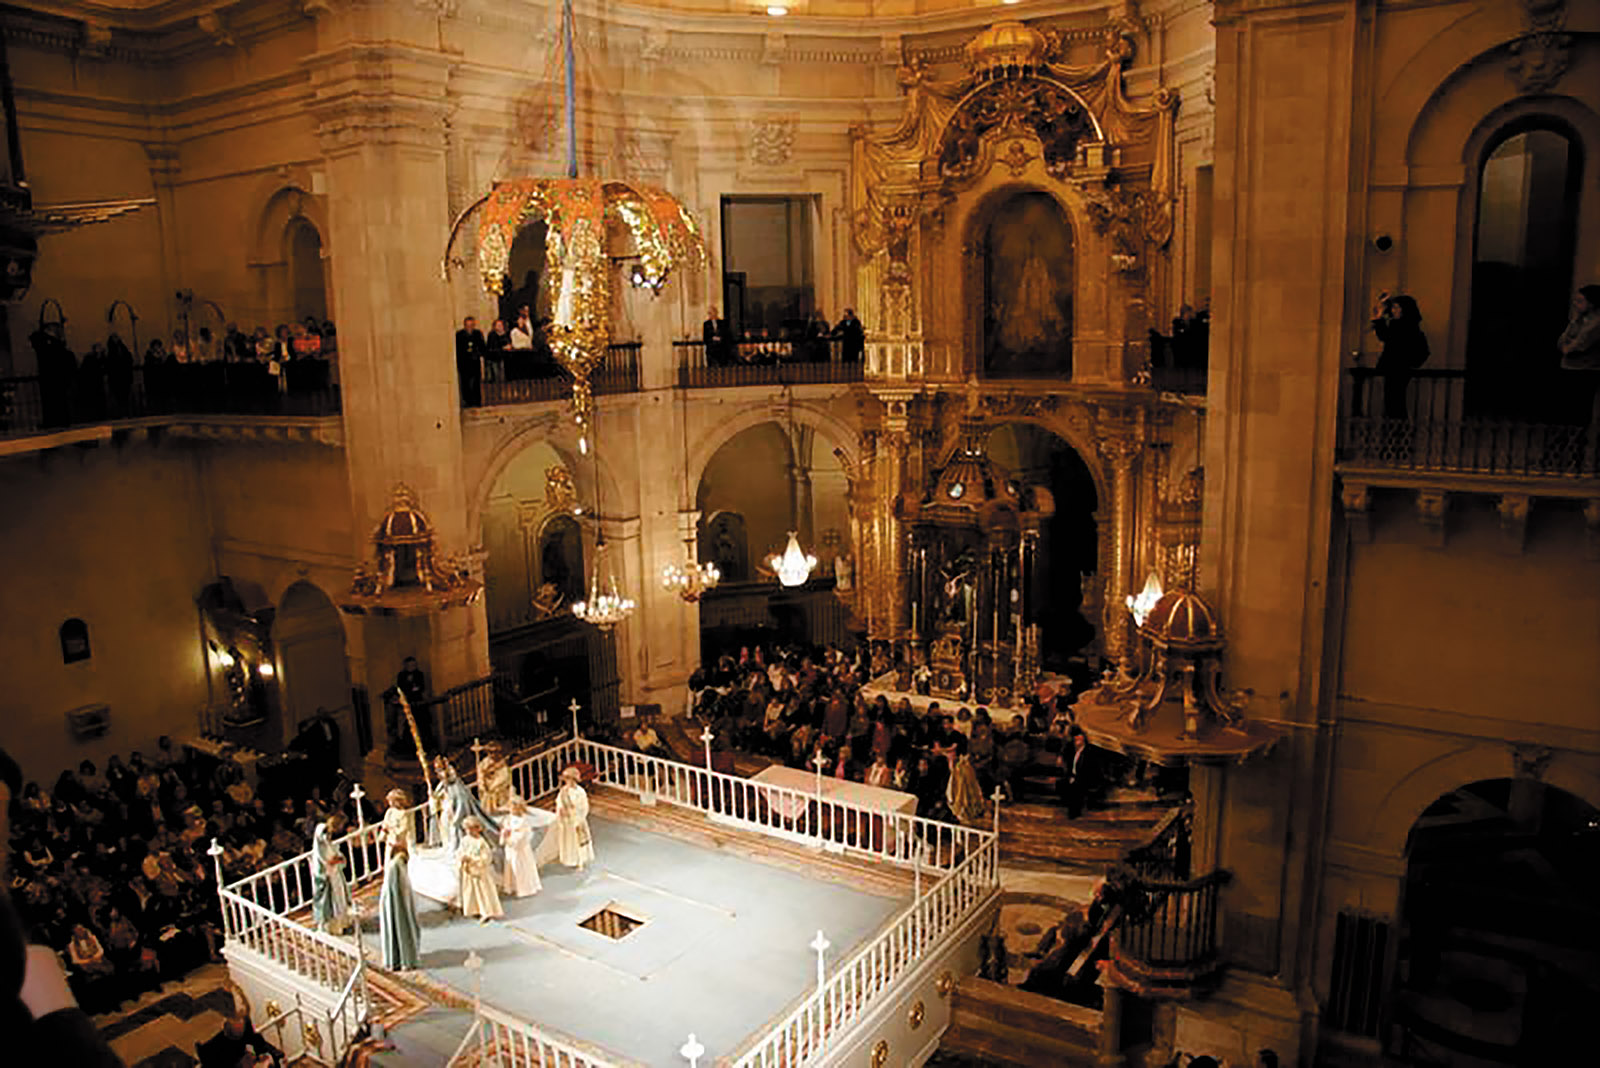 The festival of the Misteri d'Elx in the Basilica de Santa María, Elche, Spain, 2015